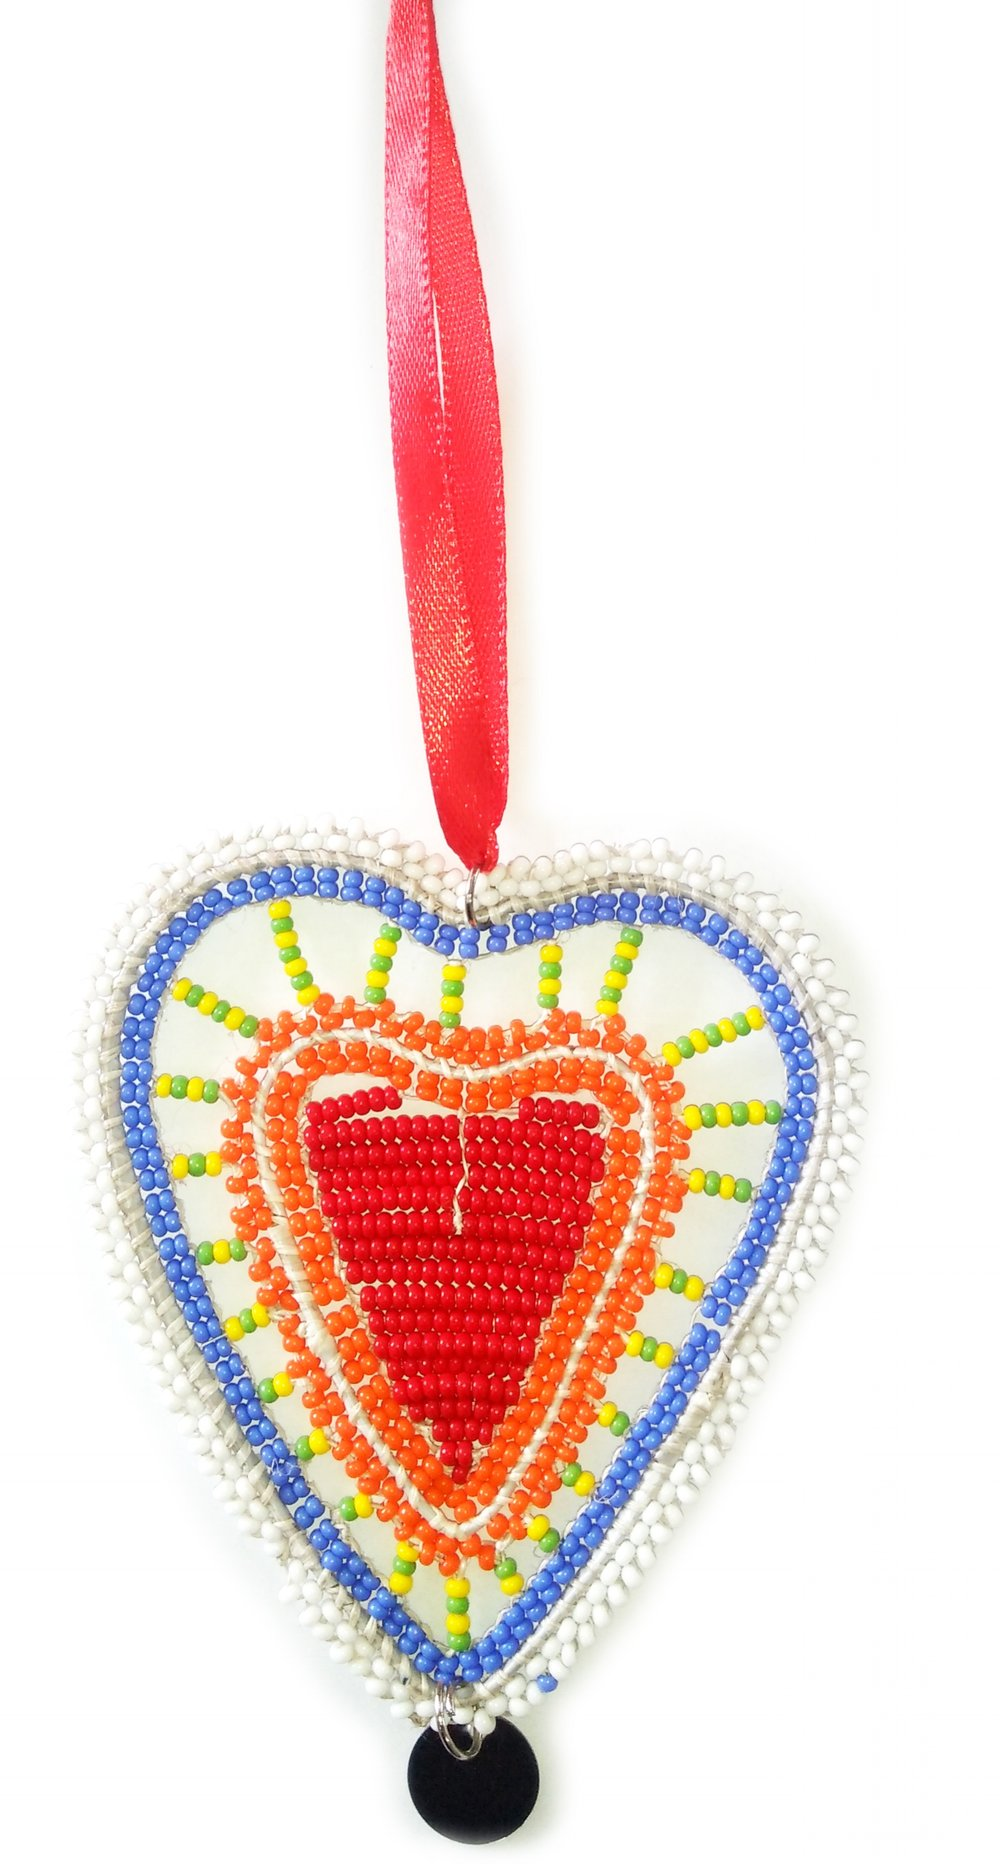 HeartDecorationTraditionalb.jpg